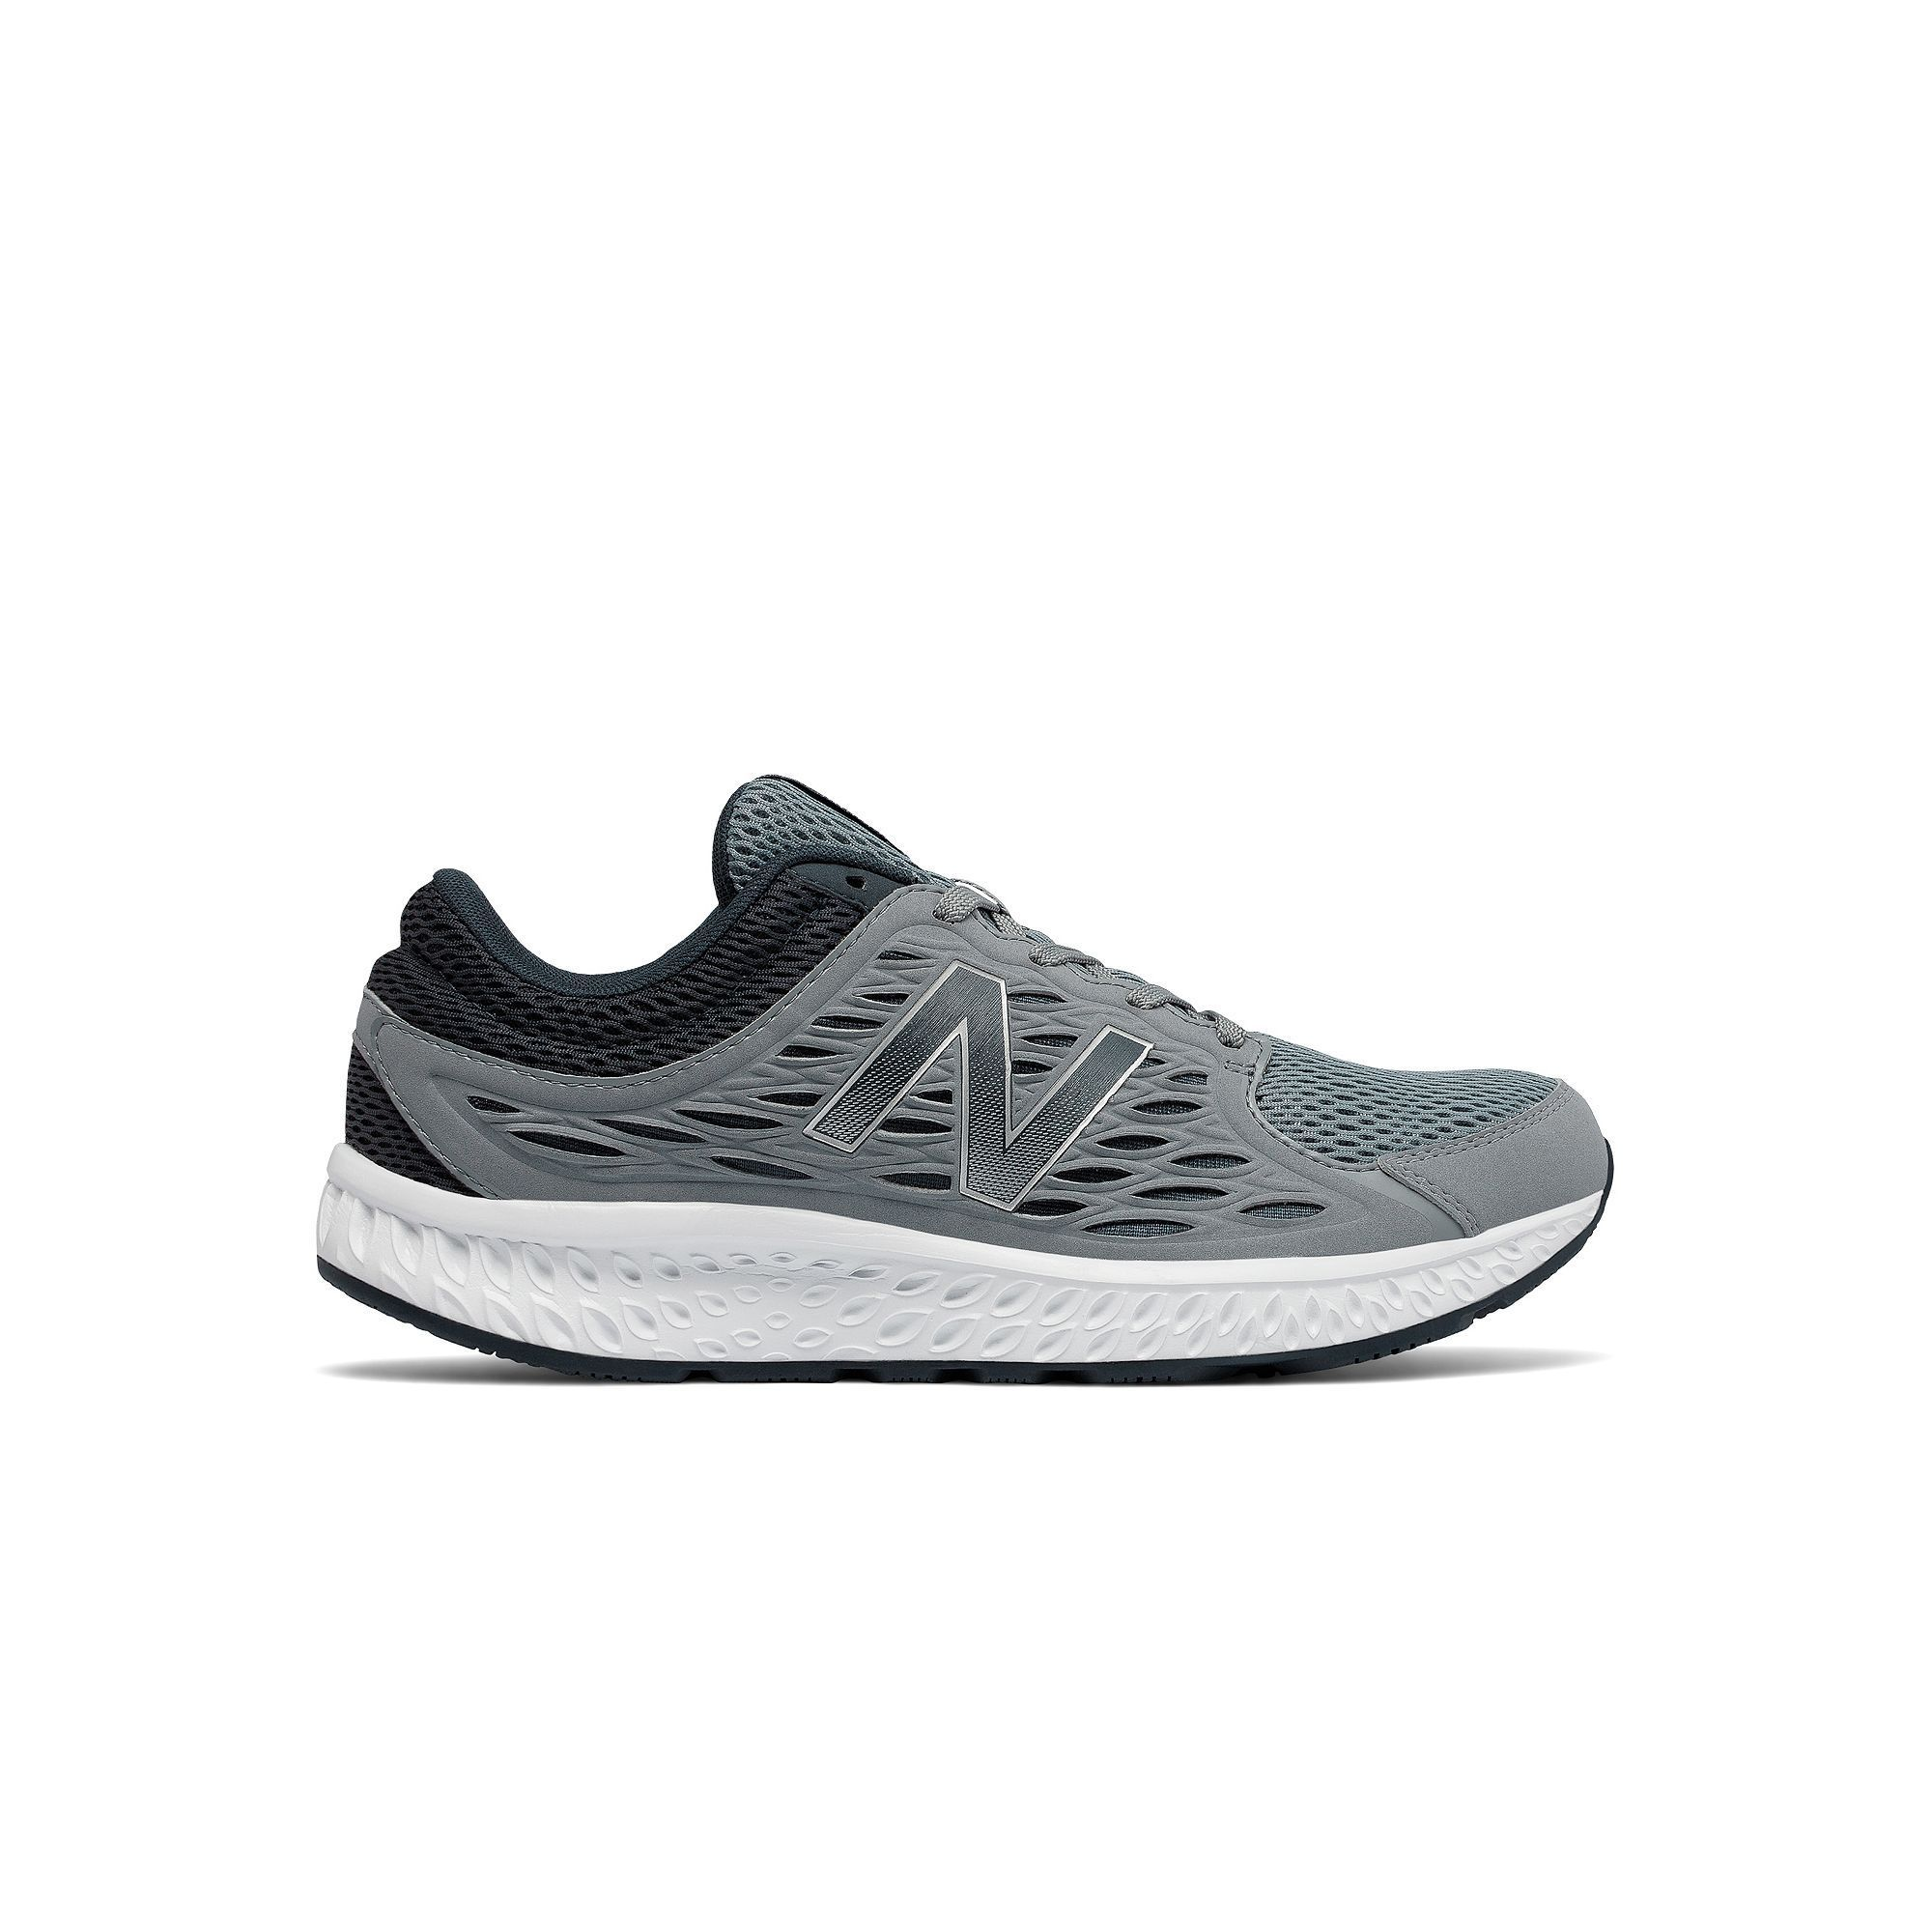 New Balance 420 v3 Men\u0027s Running Shoes, Size: 13 Ew 4E, Oxford